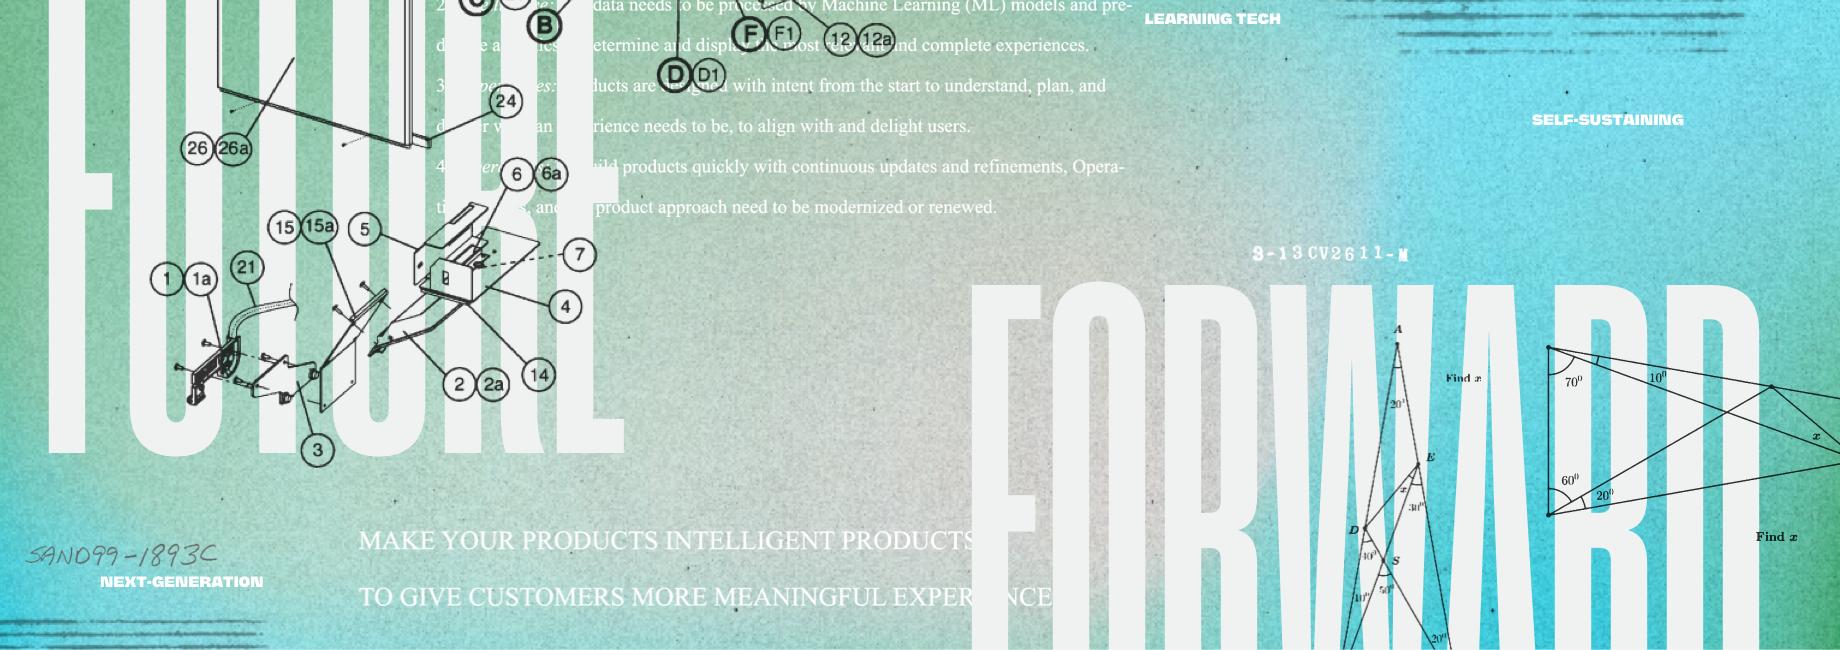 Image of Asset blueprint intelligent products future forward 01